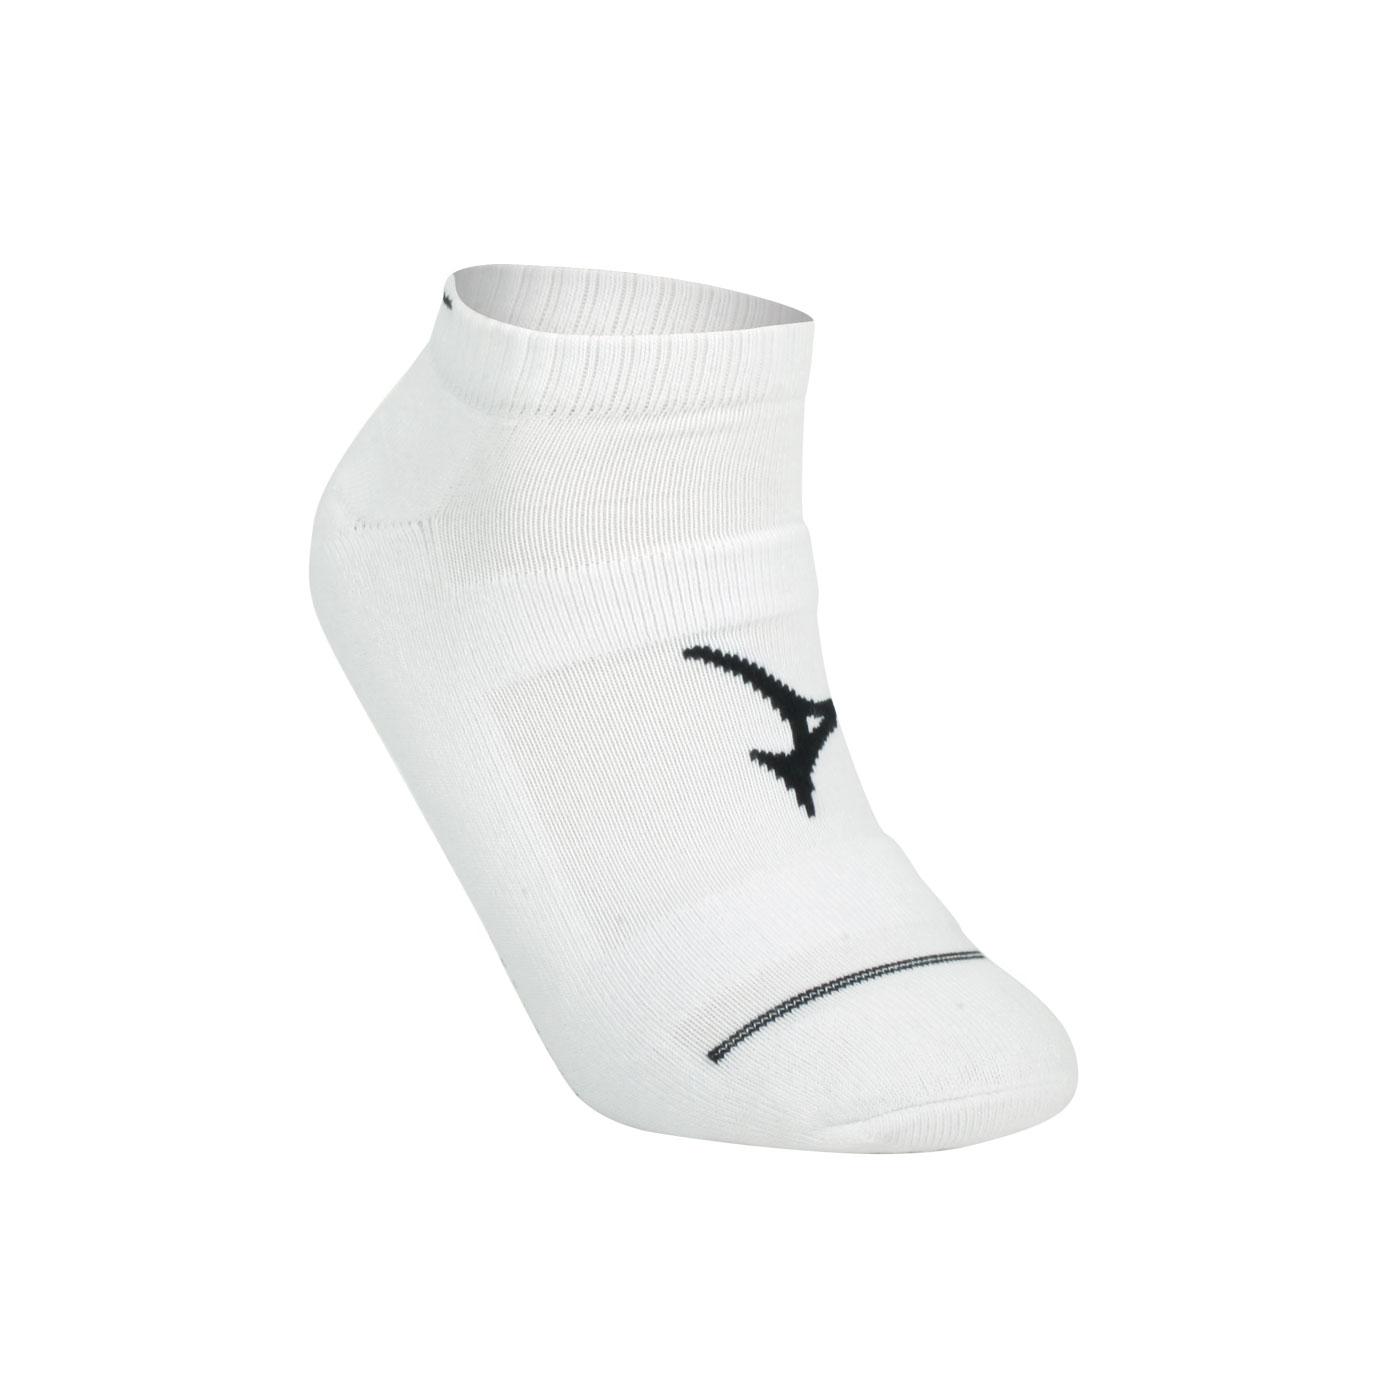 MIZUNO 男運動厚底踝襪 32TX800509 - 白黑